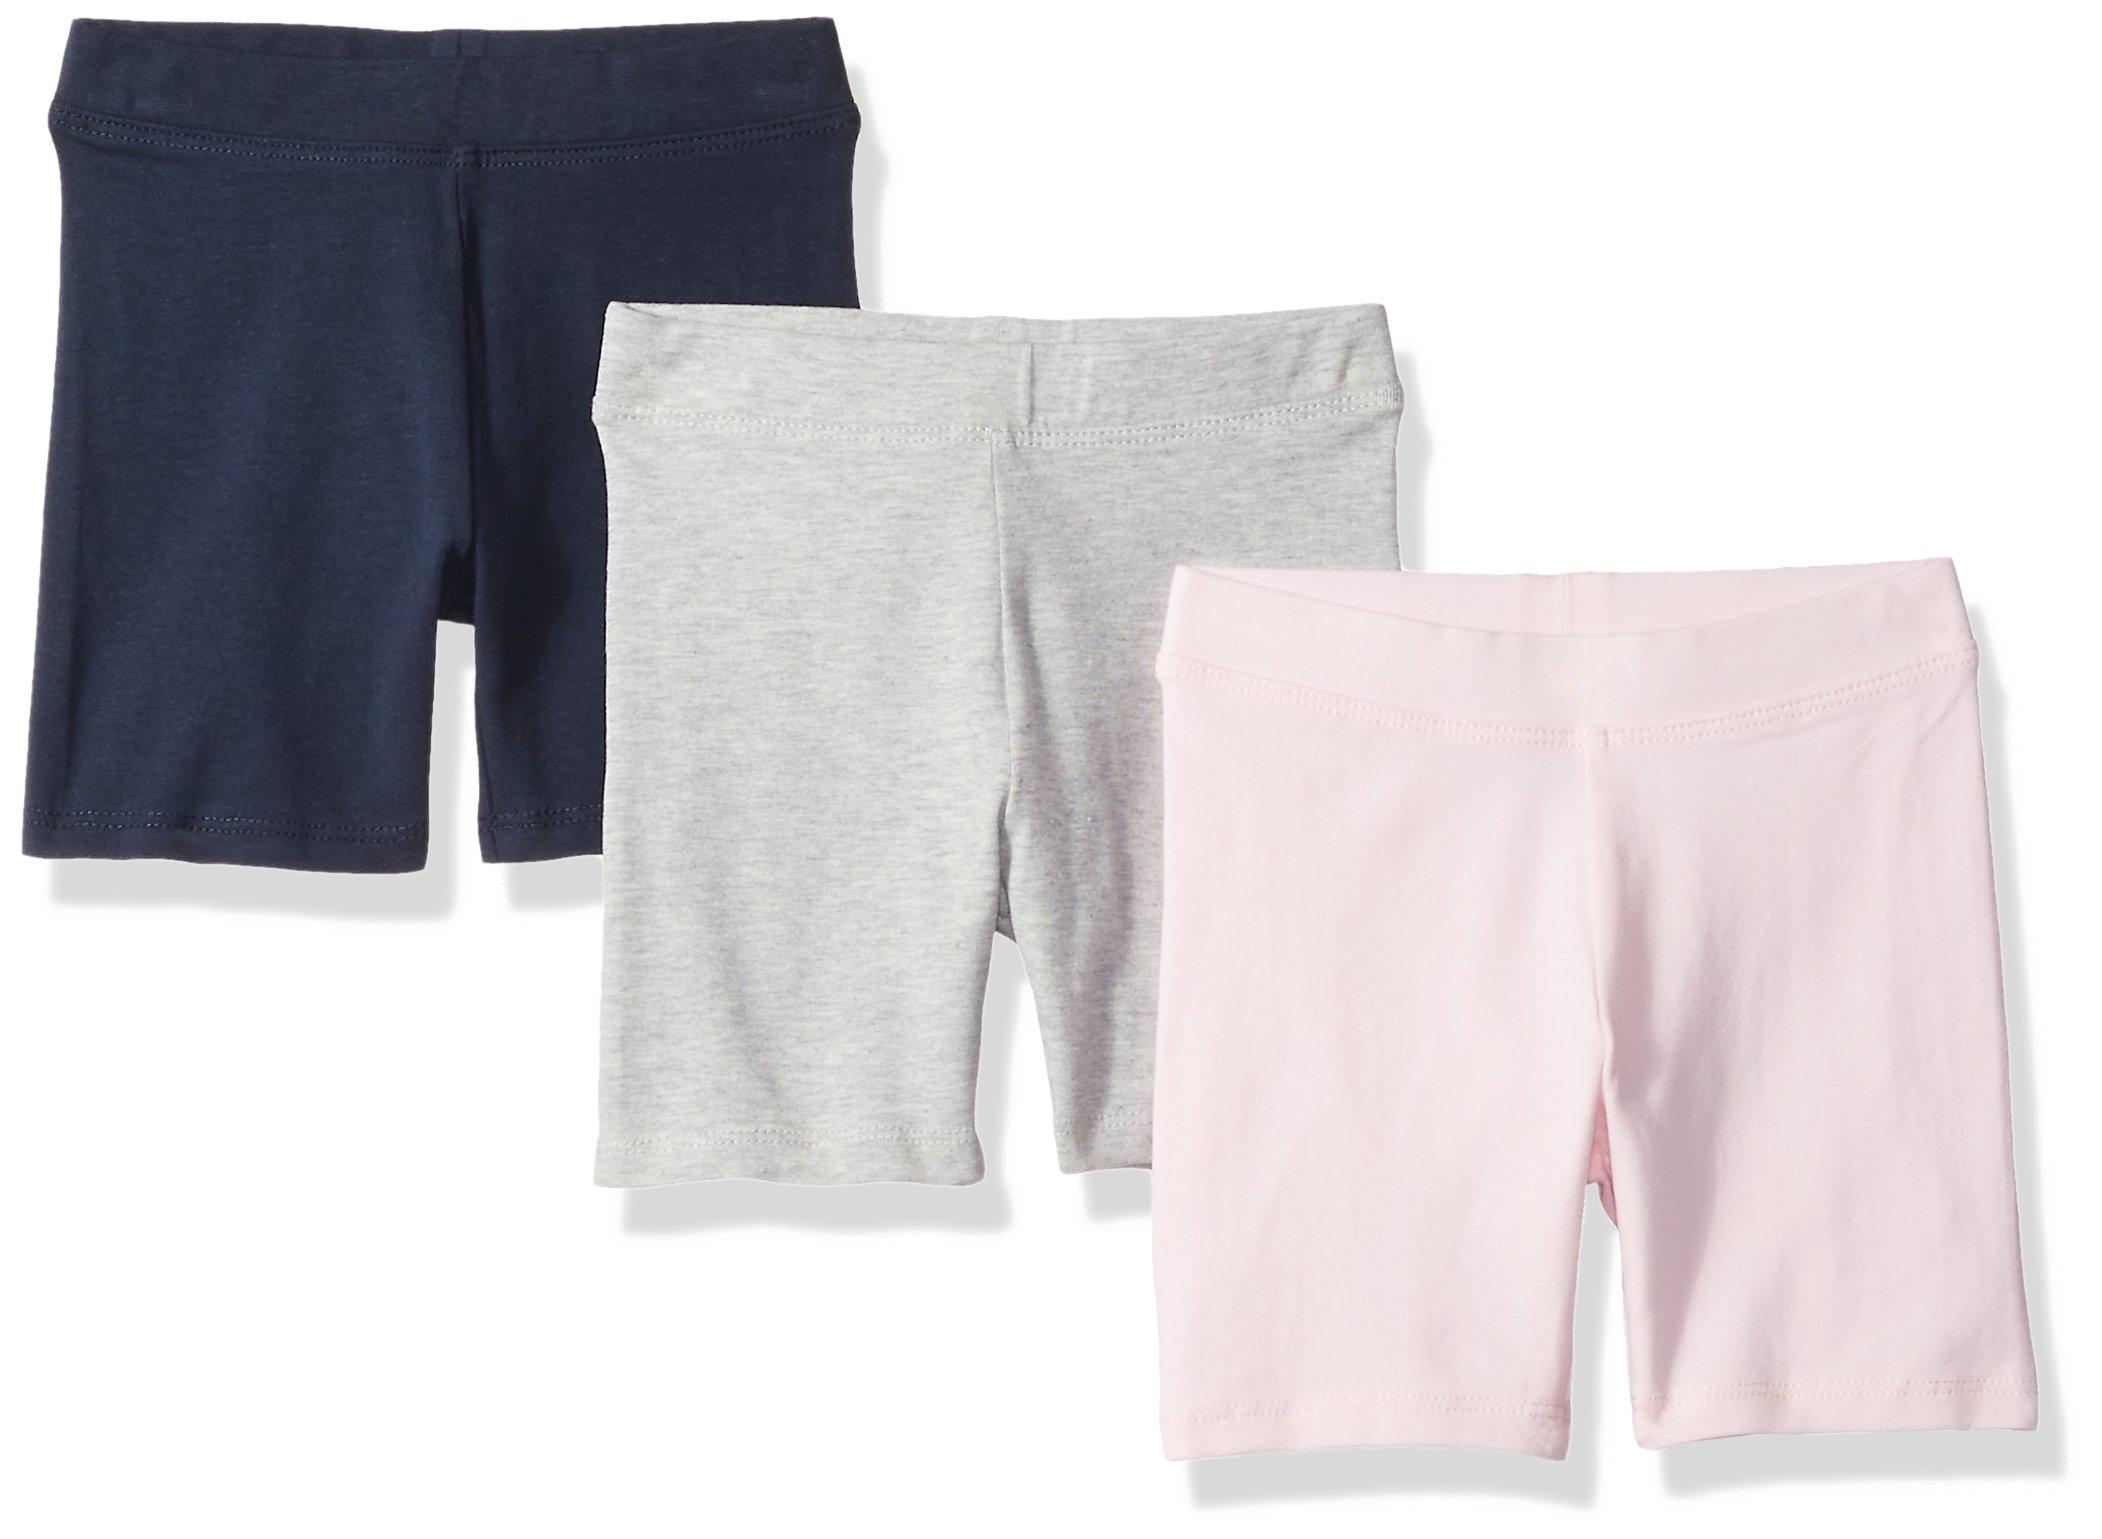 Amazon Essentials Girls' 3-Pack Cart-Wheel Short, Navy/Heather Grey/Light Pink, XS (5)